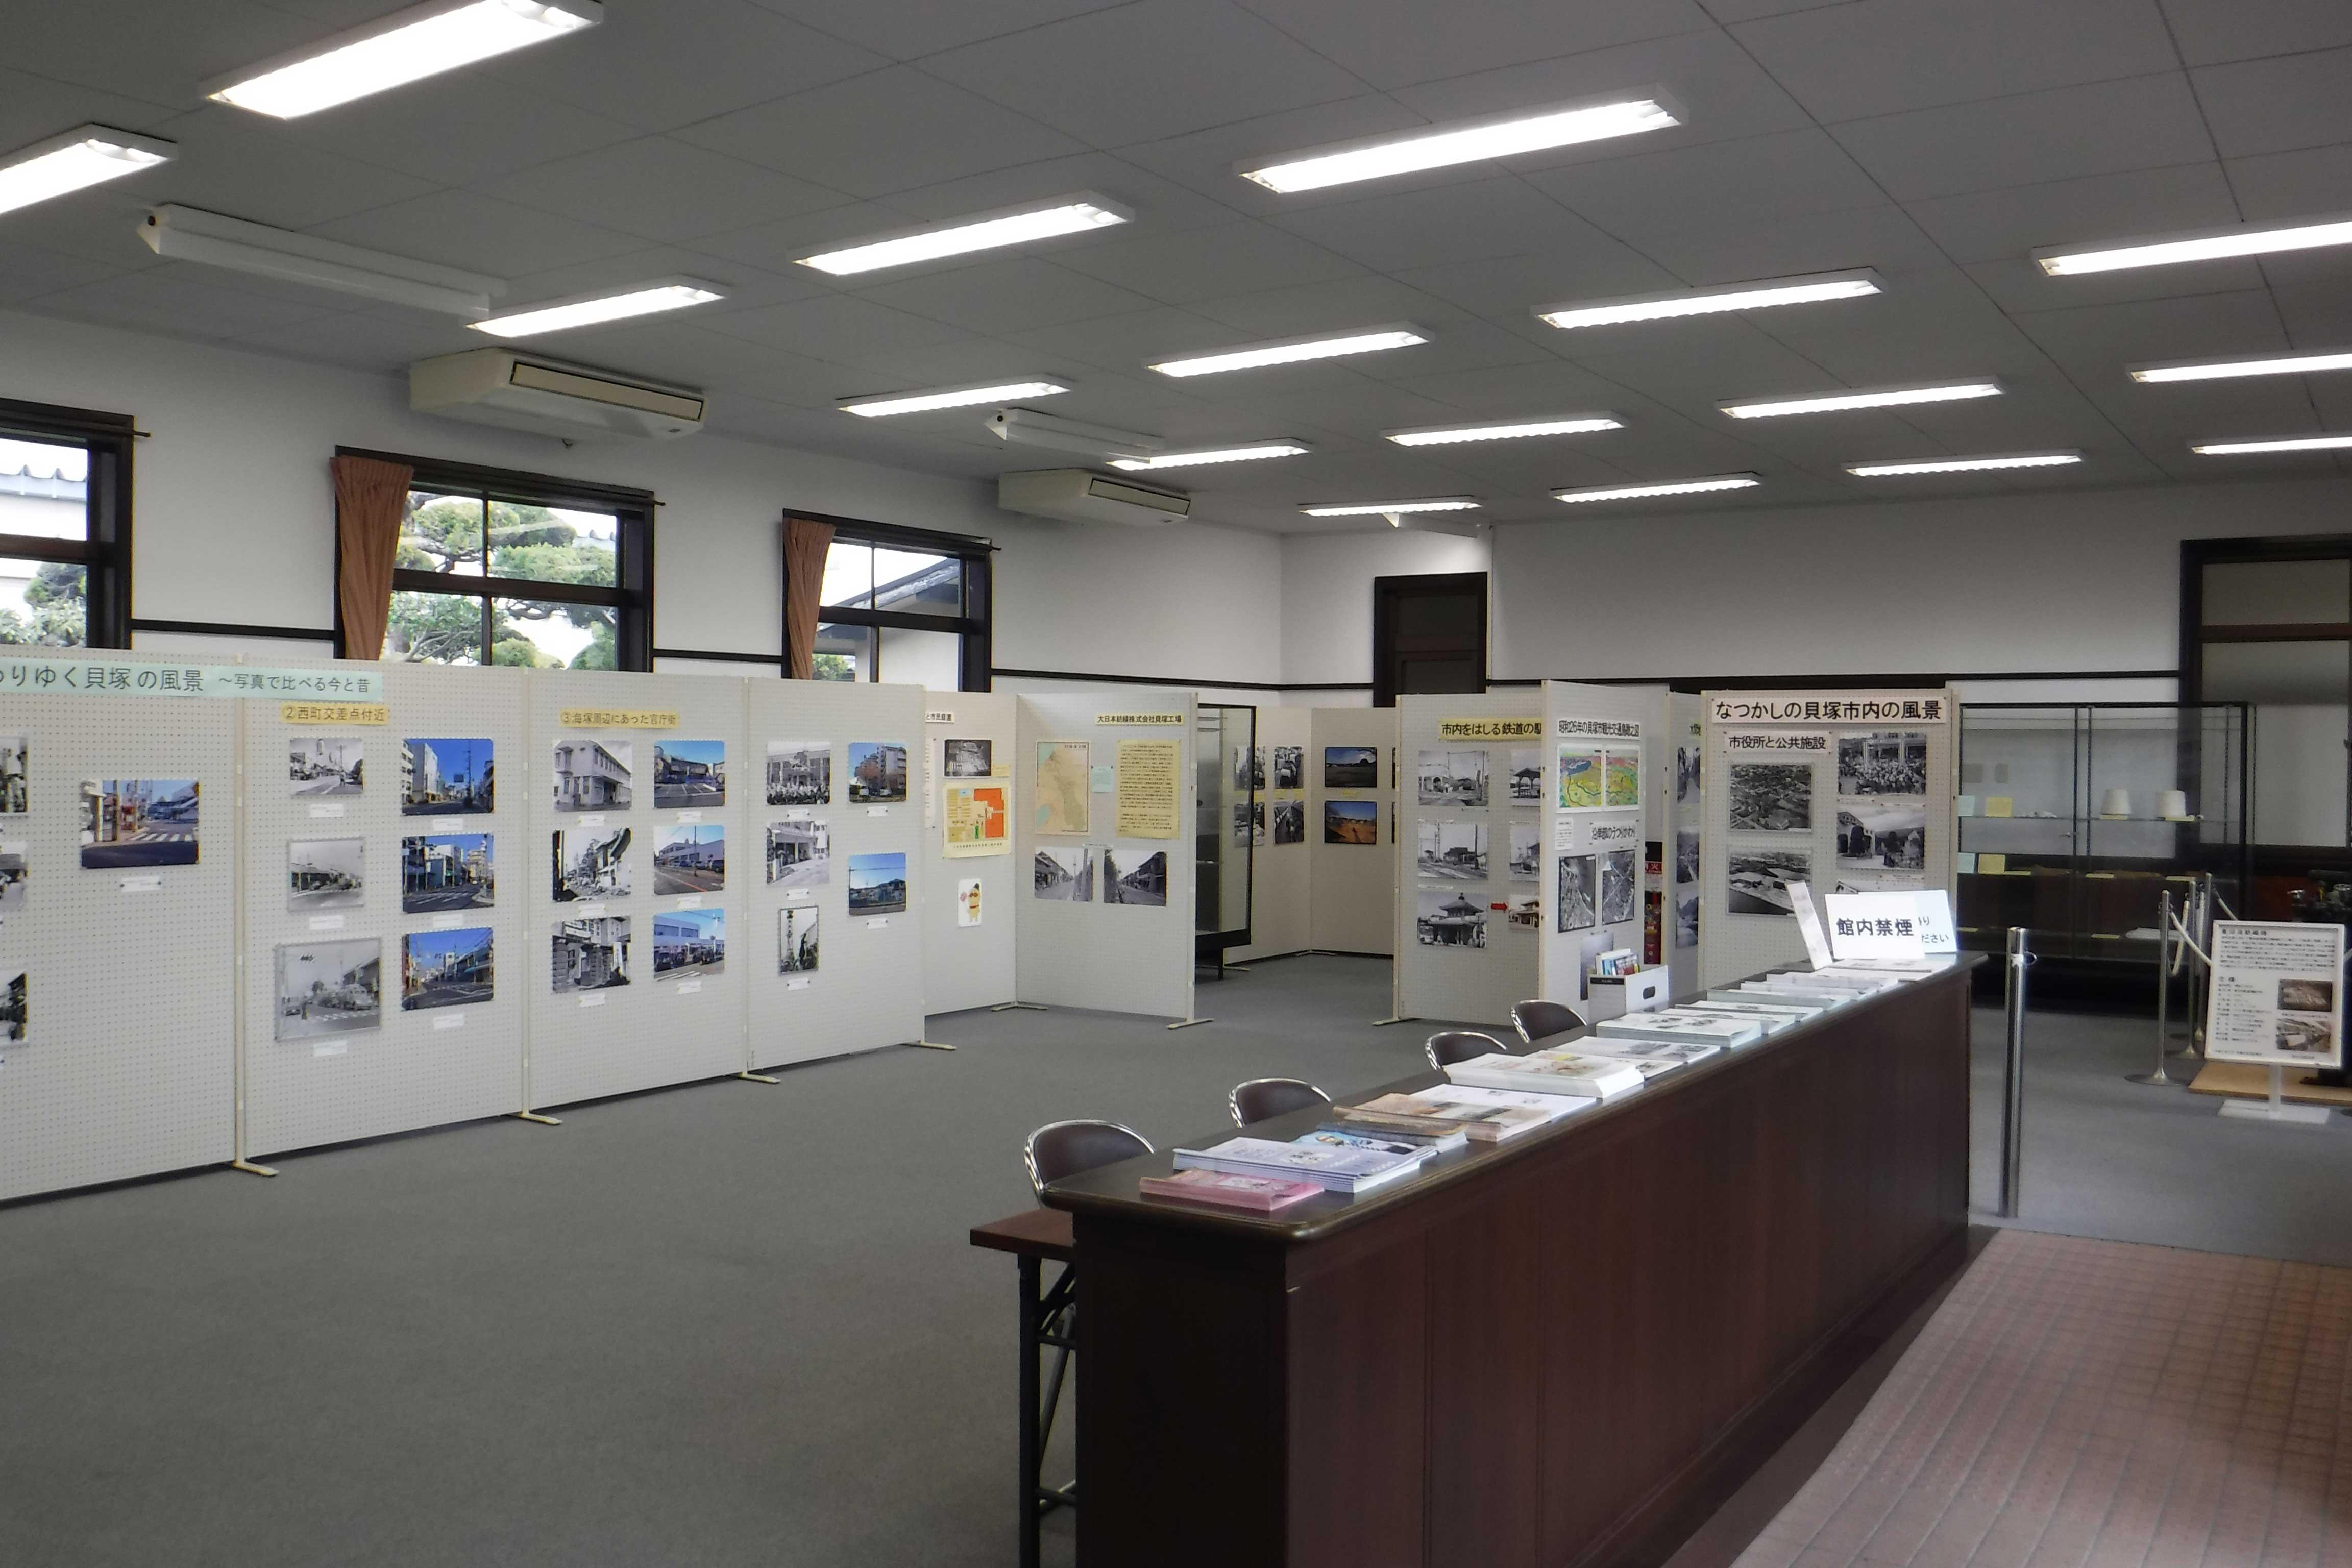 <p>展示室A</p>豊田式自動織機の実物の展示 および大日本紡績㈱貝塚工場の歴史を紹介、企画展開催